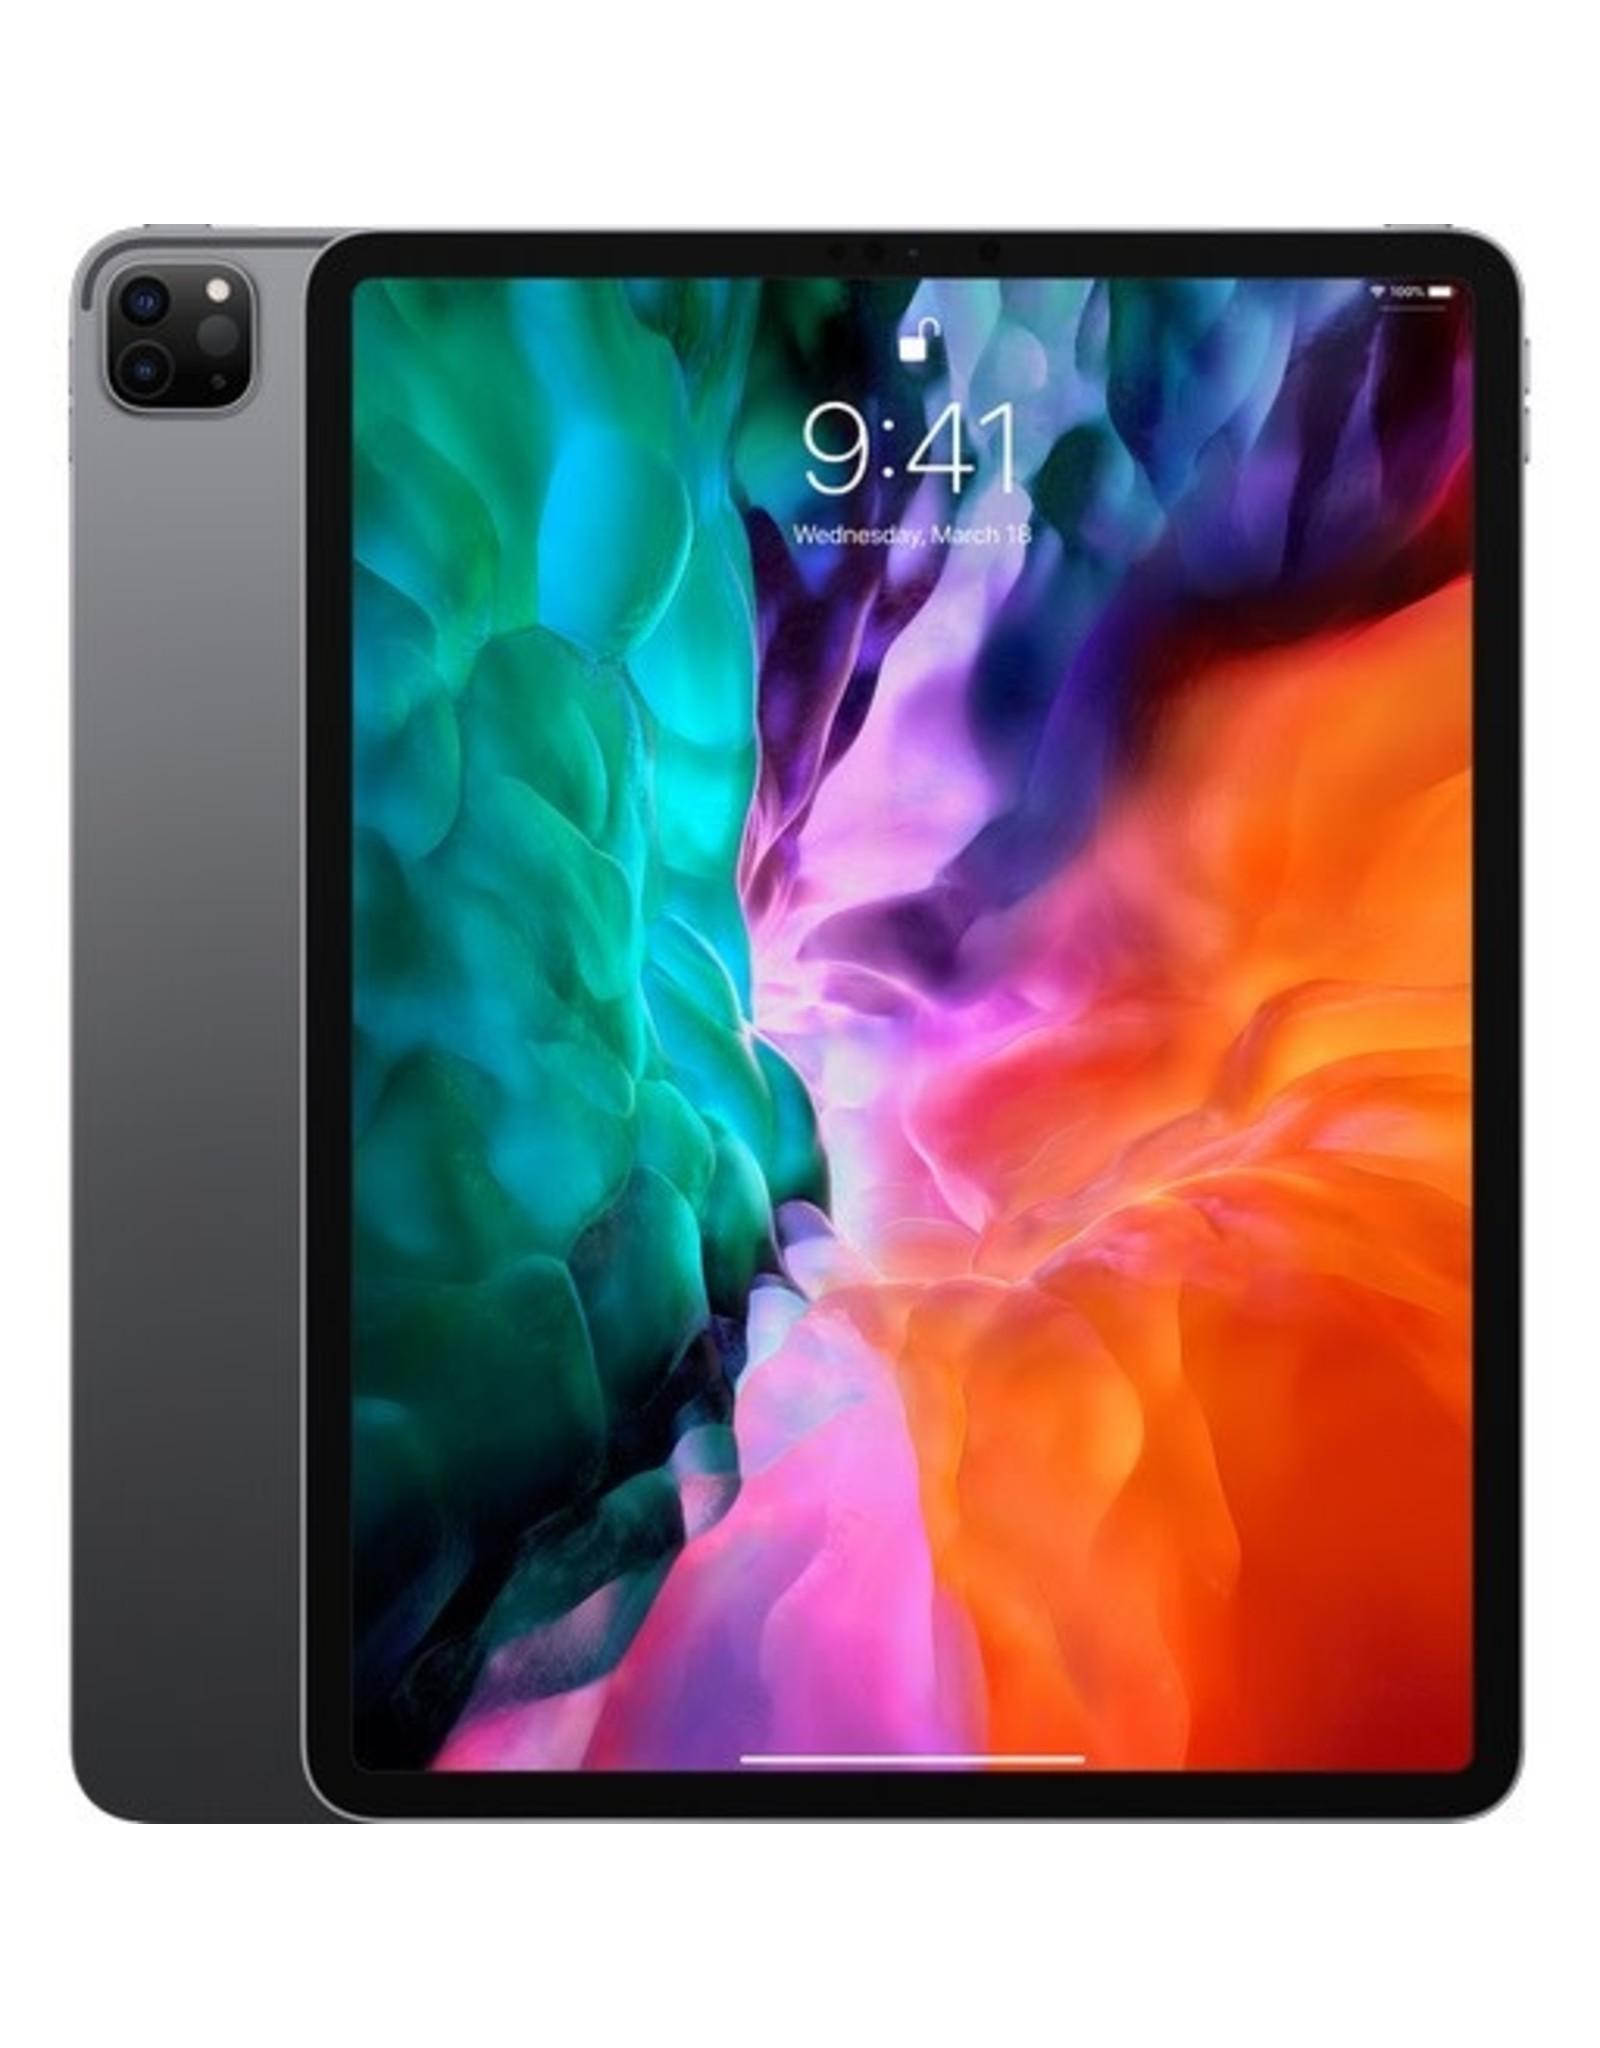 Apple Inst. (Elite) 12.9-inch iPad Pro Wi-Fi 256GB - Space Gray & AppleCare+